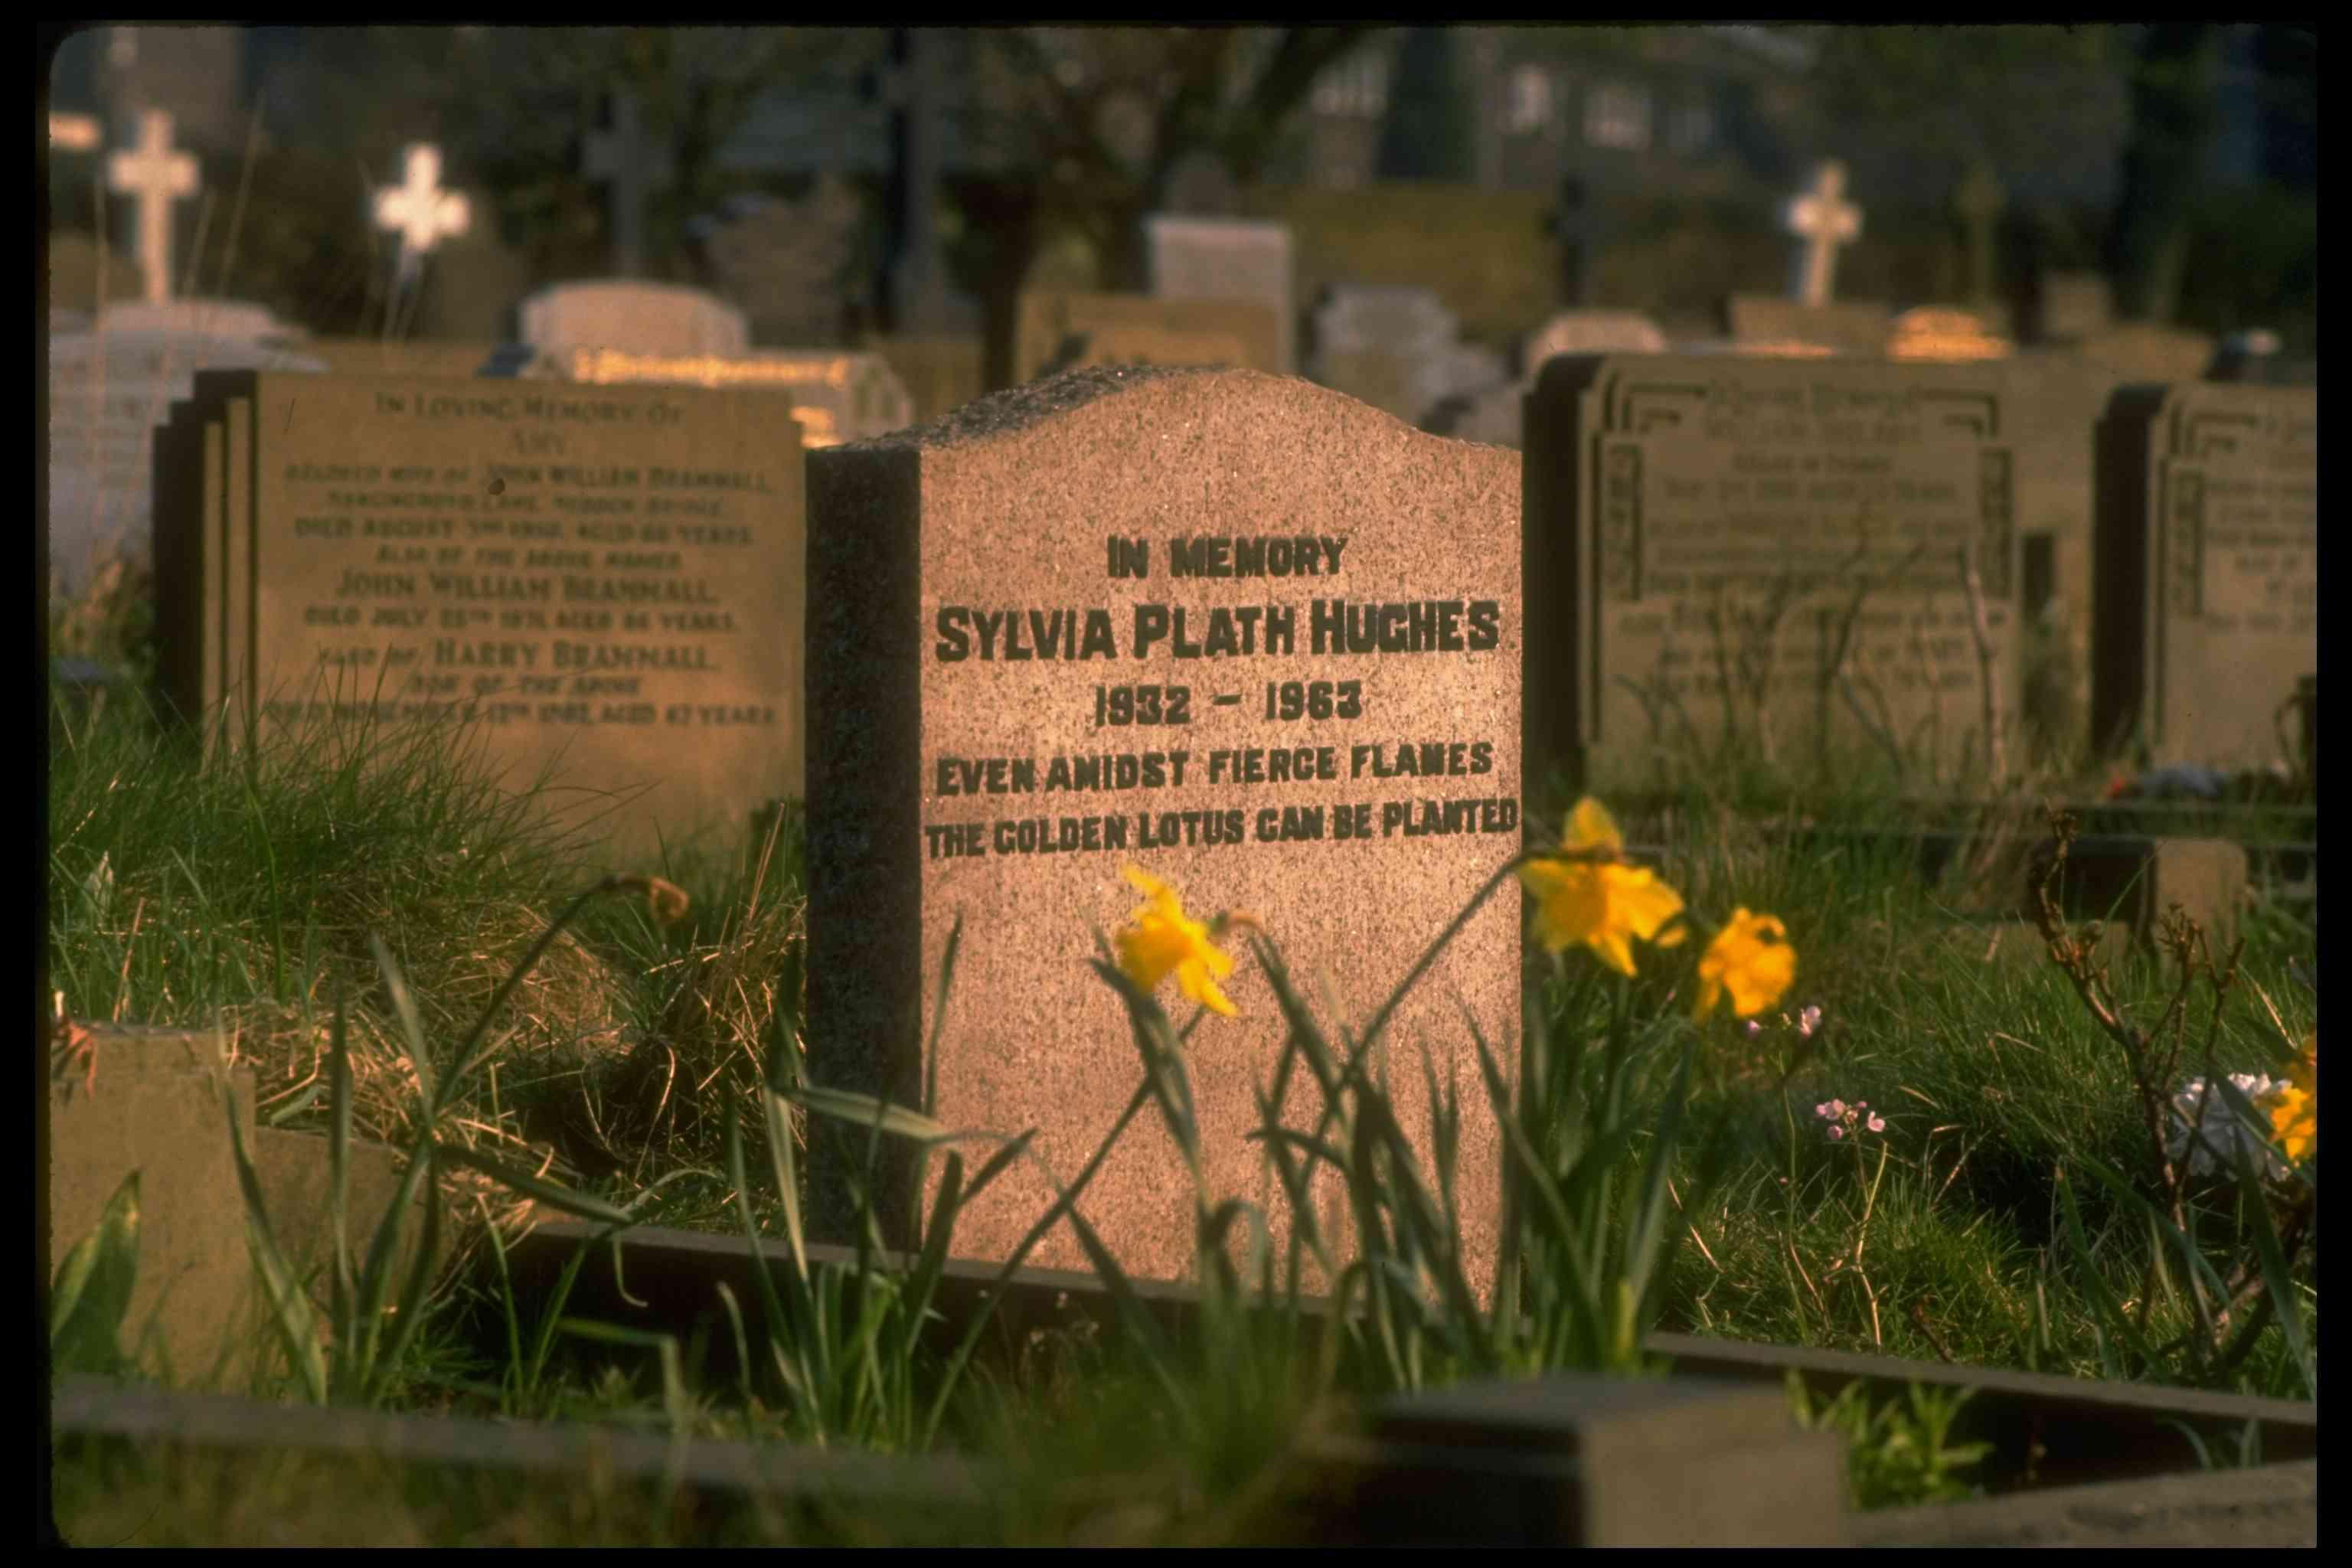 Sylvia Plath's gravestone with inscription